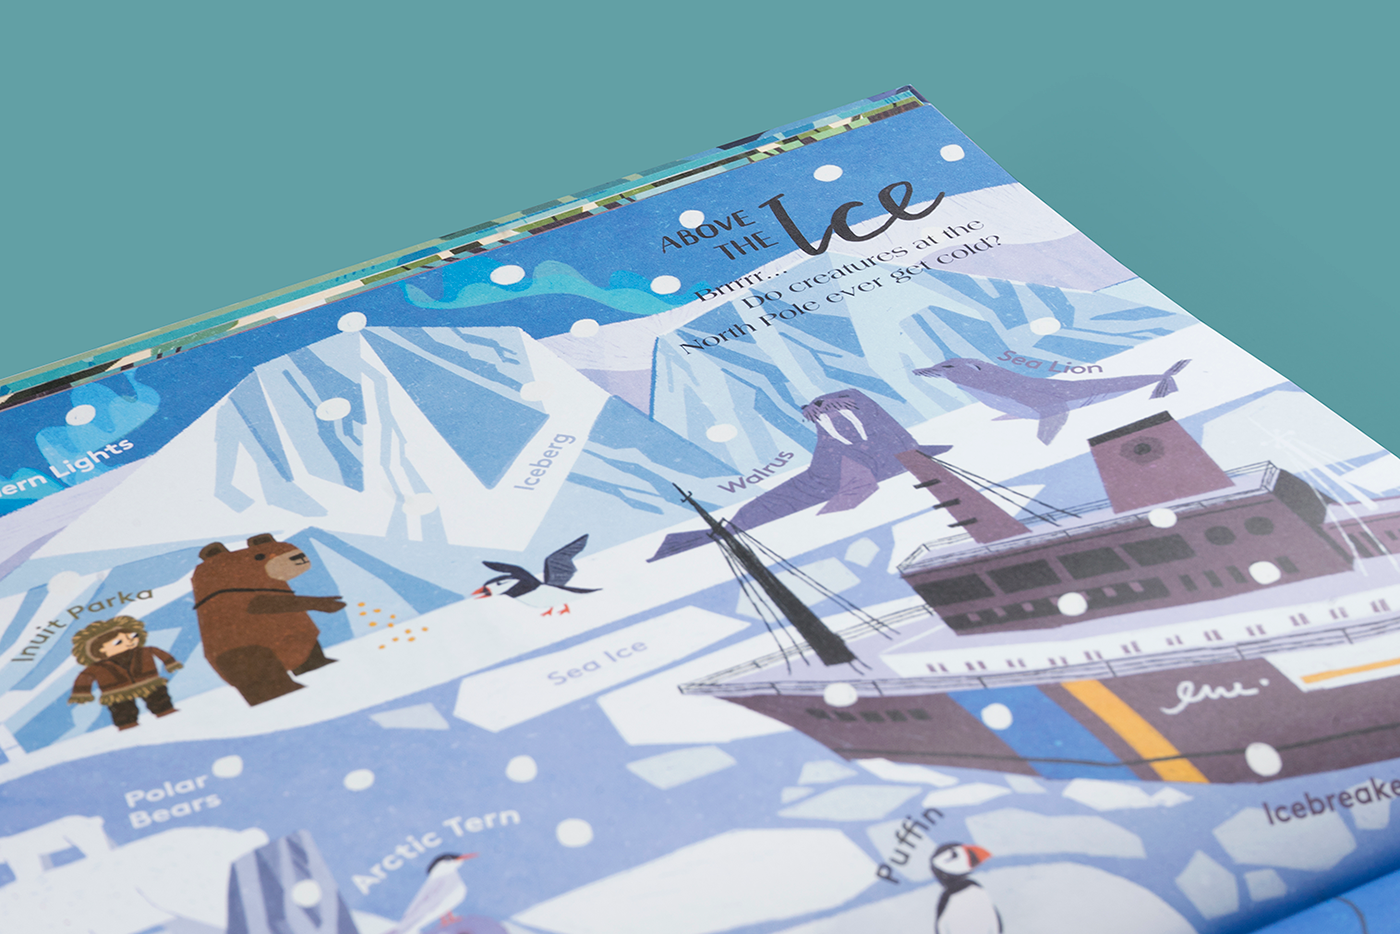 childrens book Picture book explore Travel kids bear vocabulary digital illustration